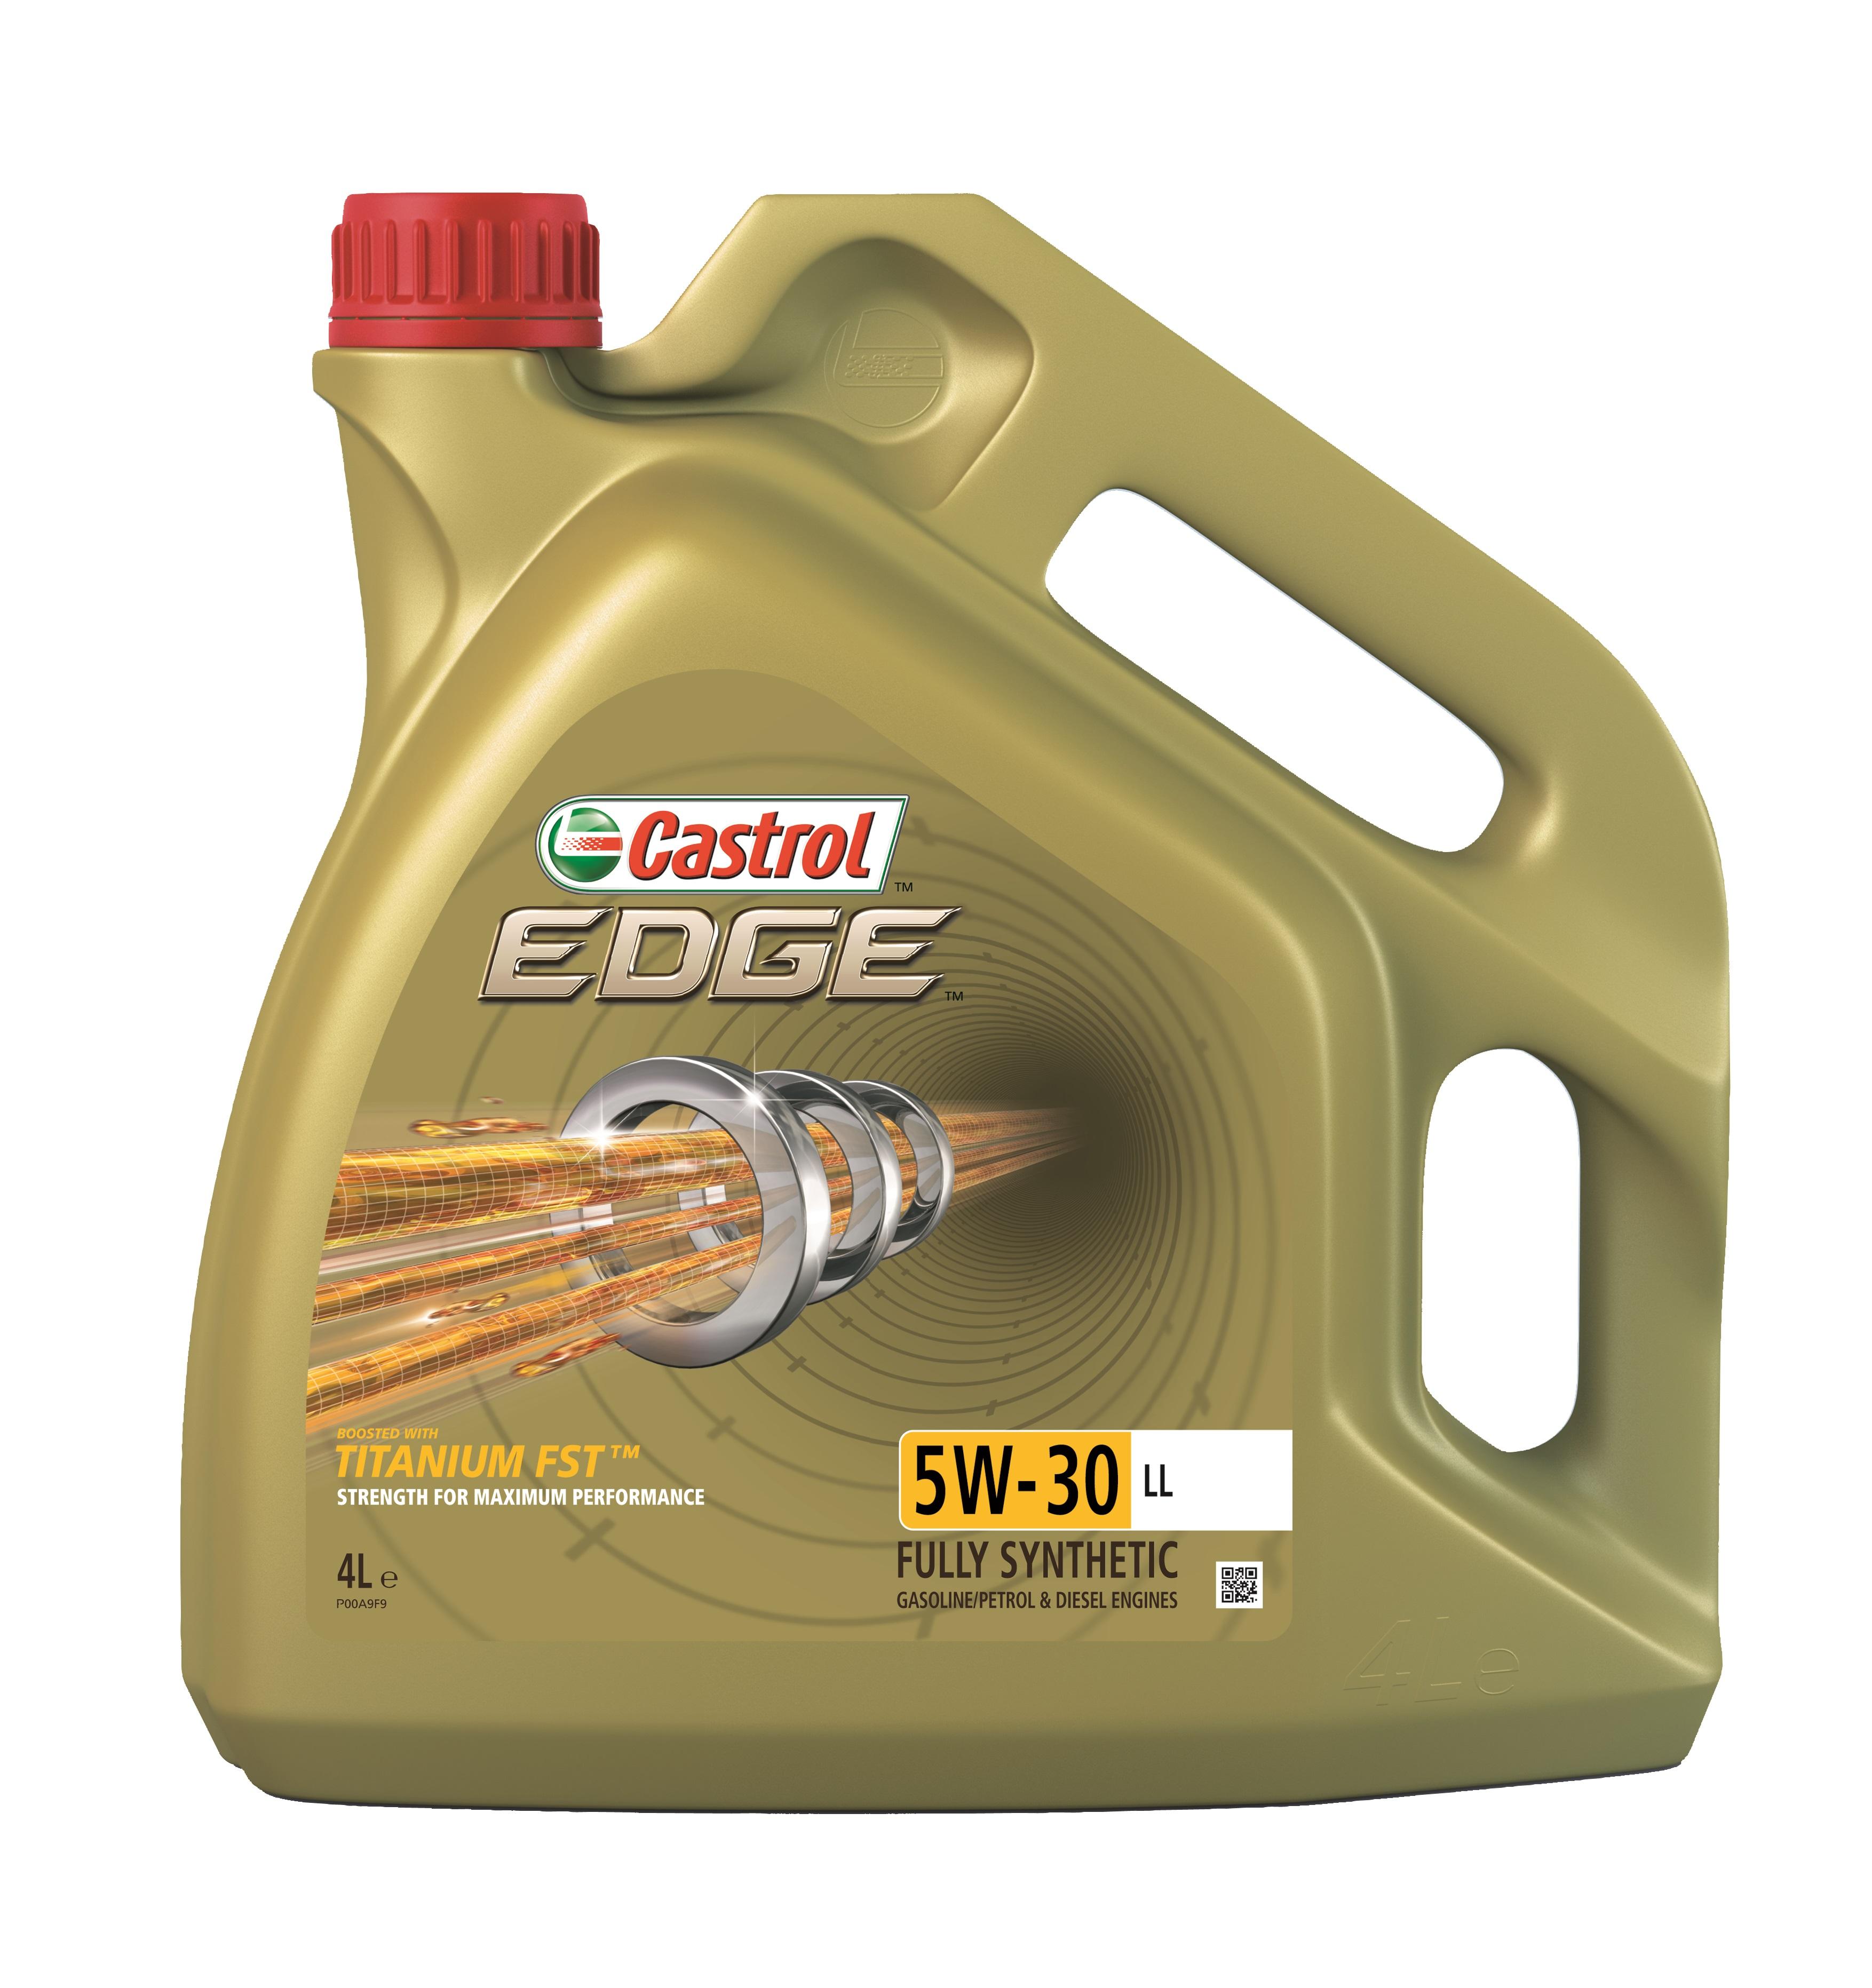 Splinternye Motorolie billigst! Find motorolie til din bil | Landberg.dk TG-55